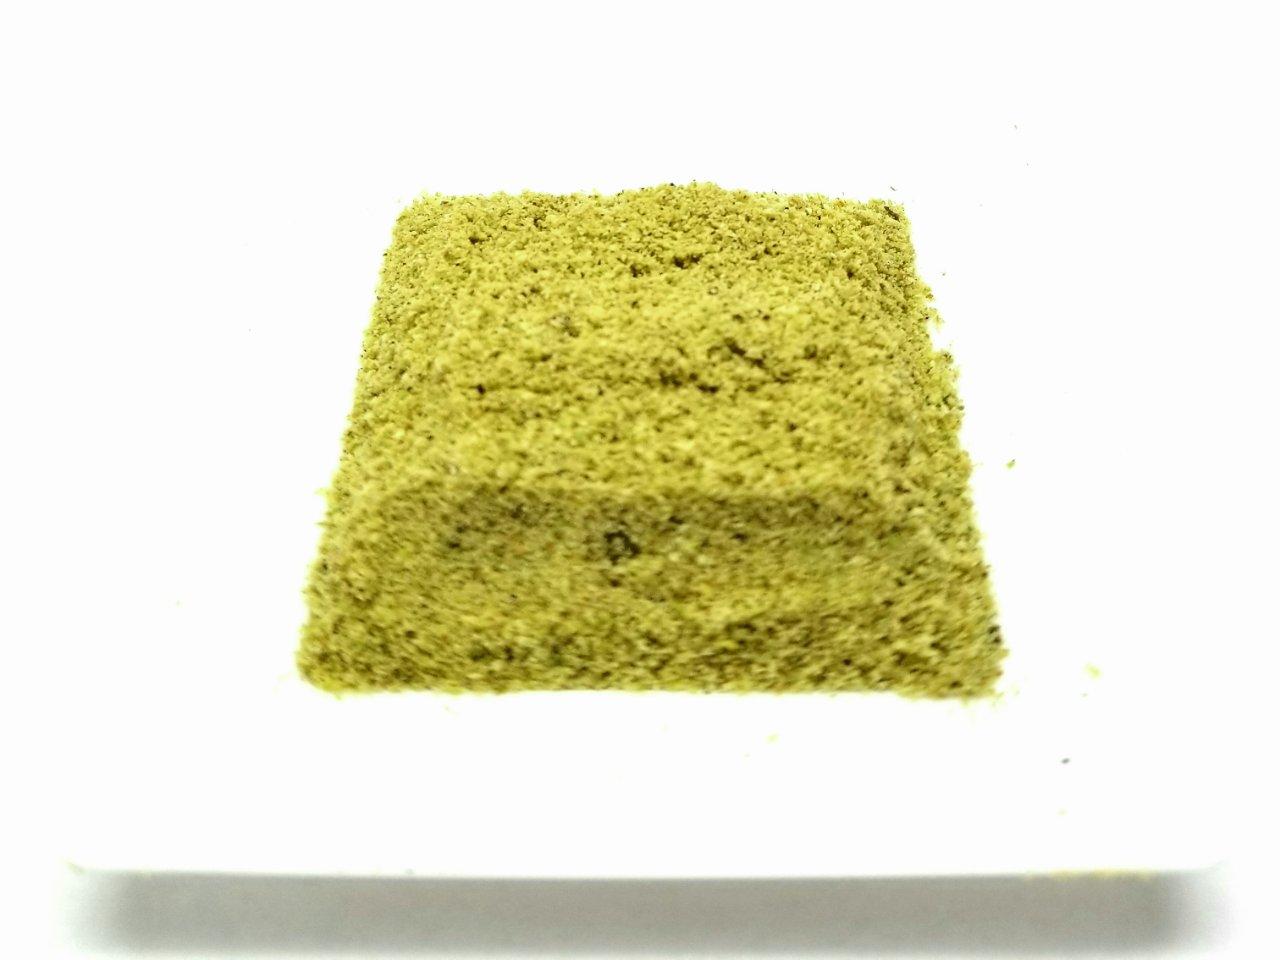 Pistachios, Green California Shelled Raw Flour (2 lbs.) by Presto Sales LLC